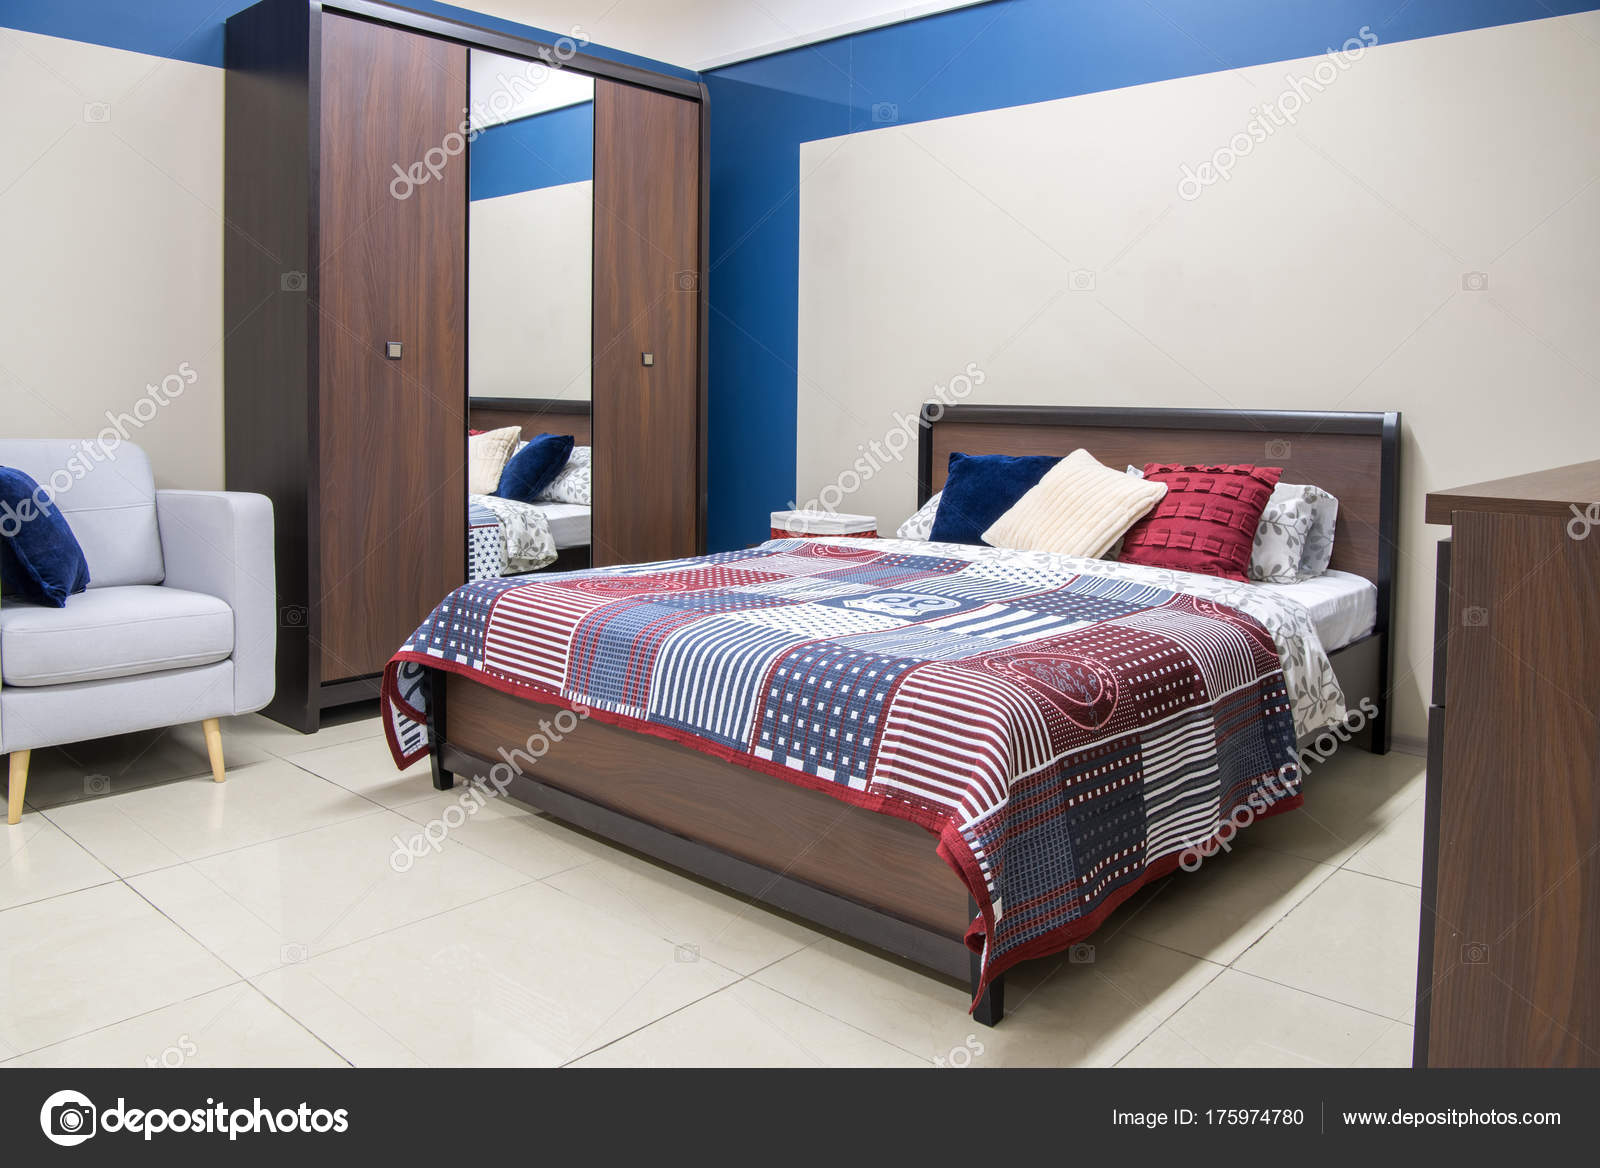 https://st3.depositphotos.com/13194036/17597/i/1600/depositphotos_175974780-stock-photo-cozy-modern-bedroom-interior-bed.jpg